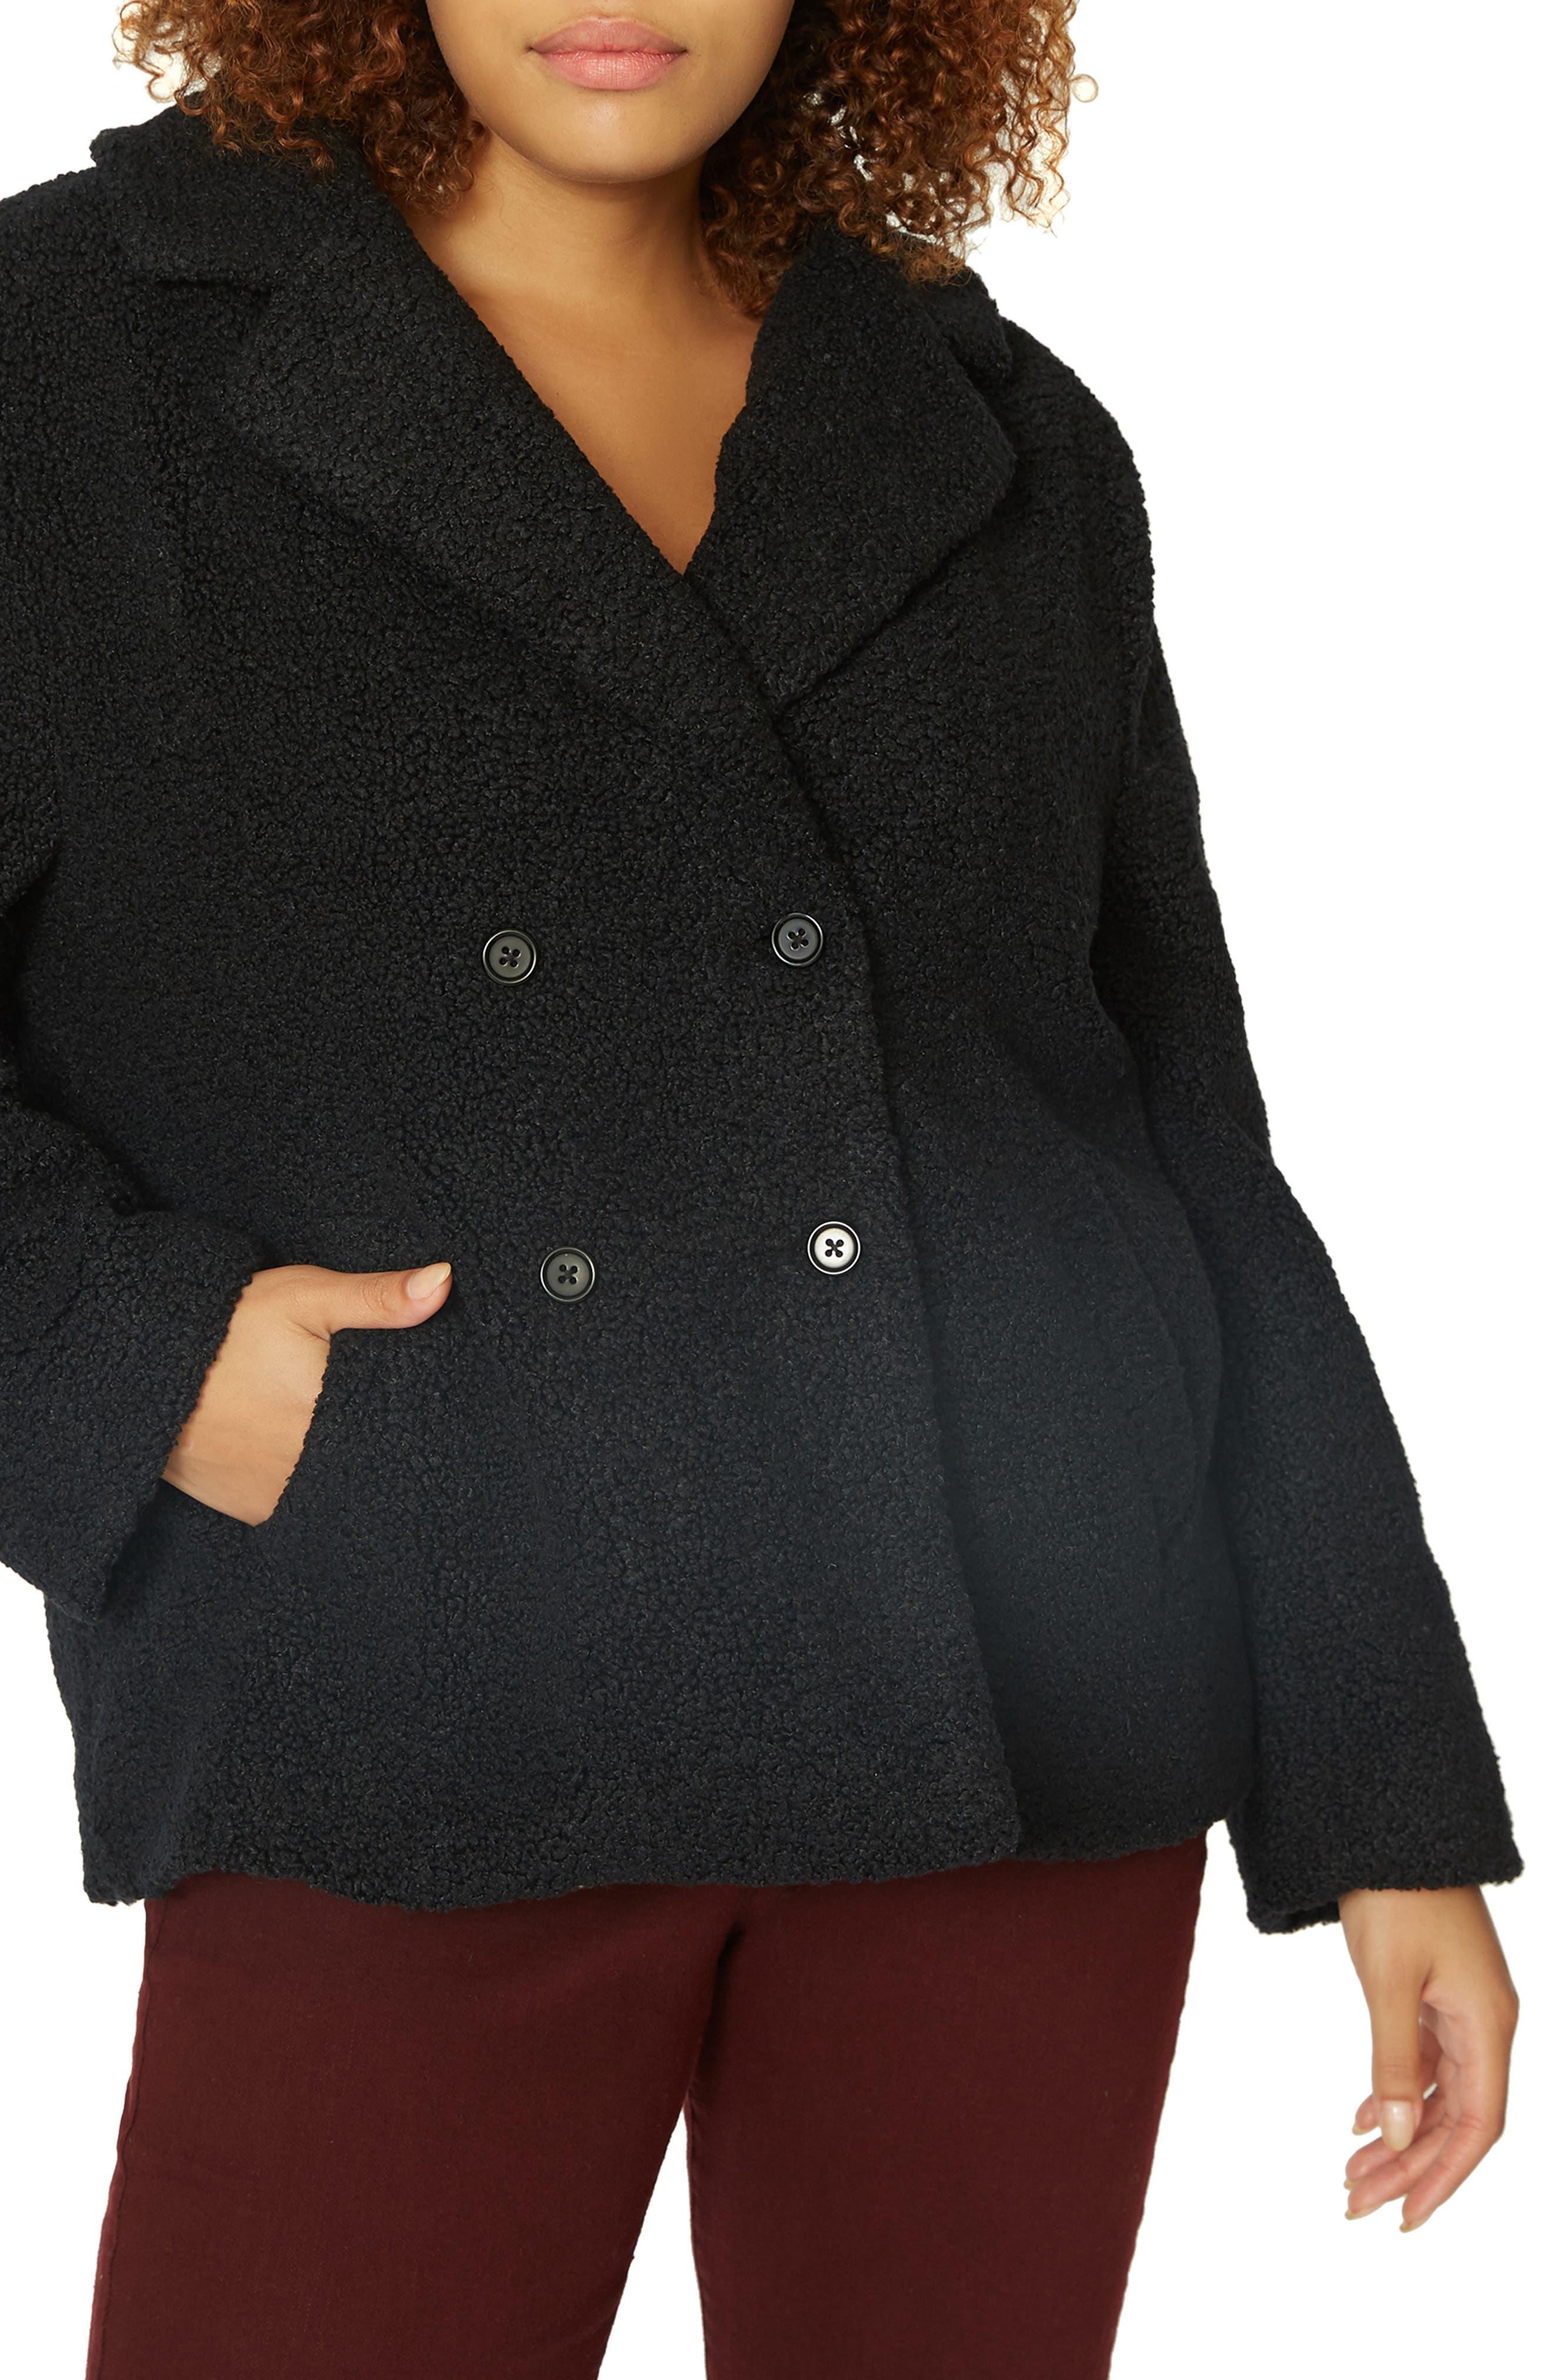 Free Spirit Faux Shearling Coat,                             Main thumbnail 1, color,                             BLACK